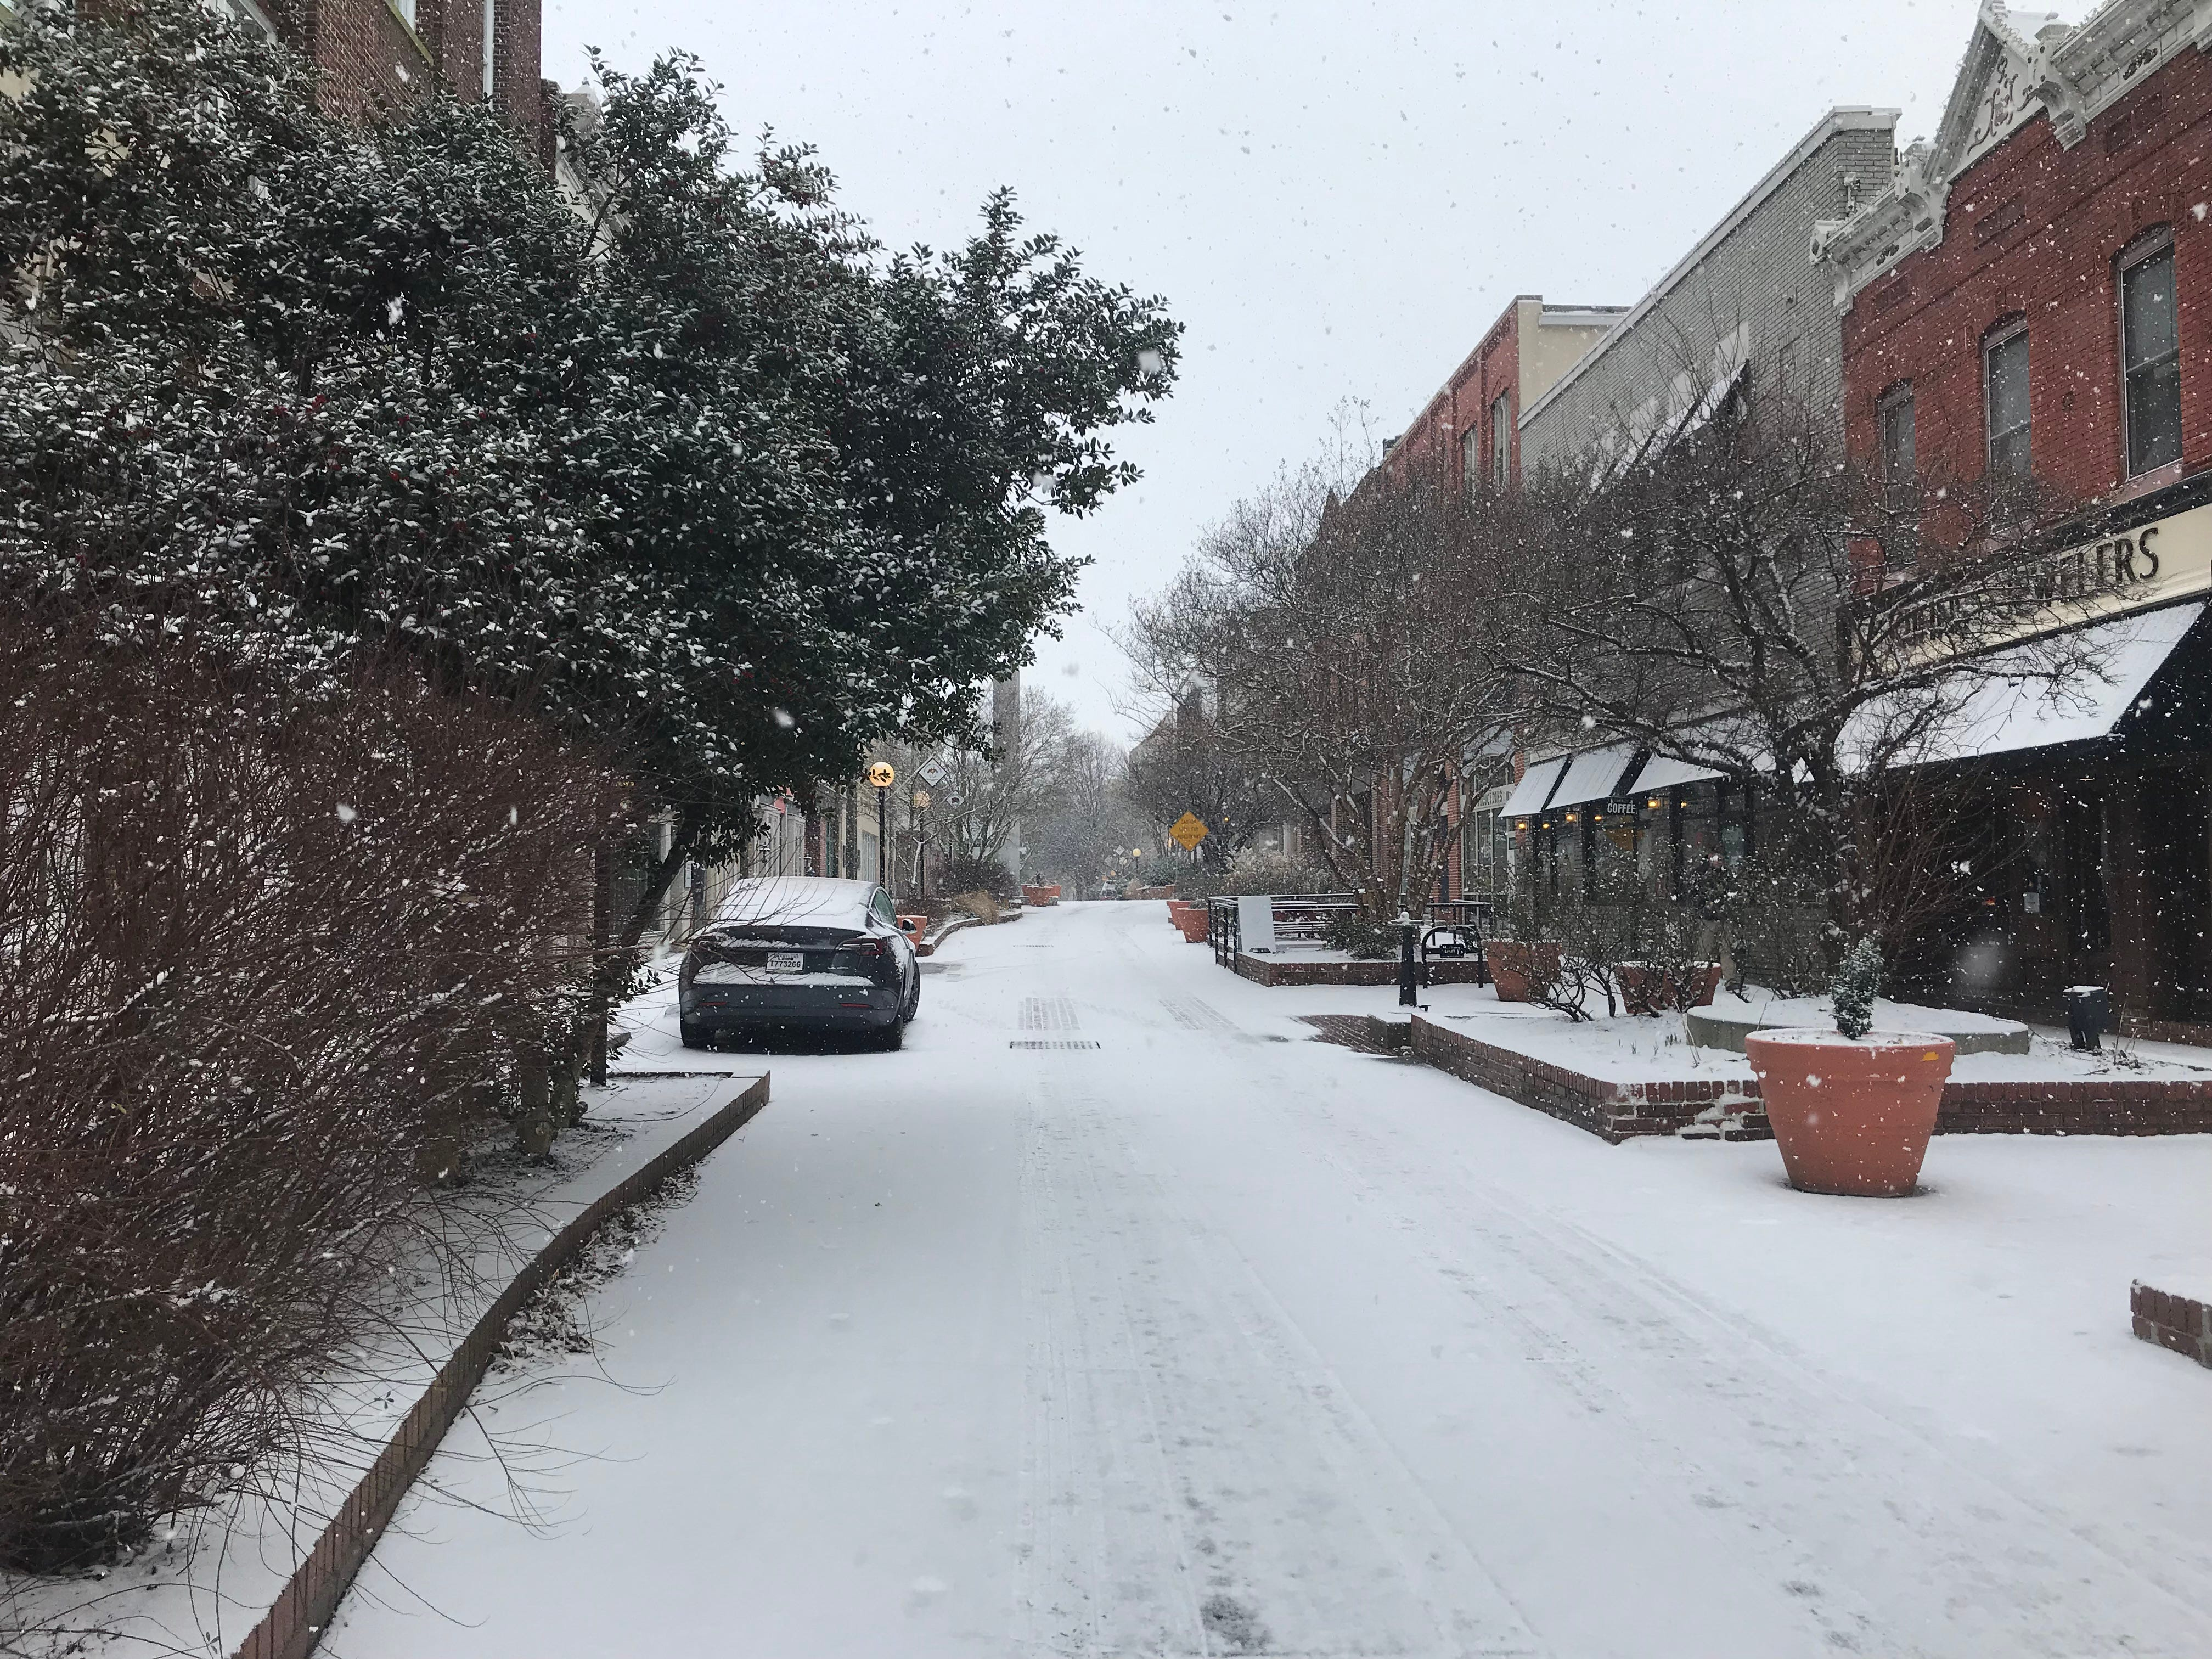 Snow blankets downtown Salisbury on Friday, Feb. 1, 2019.